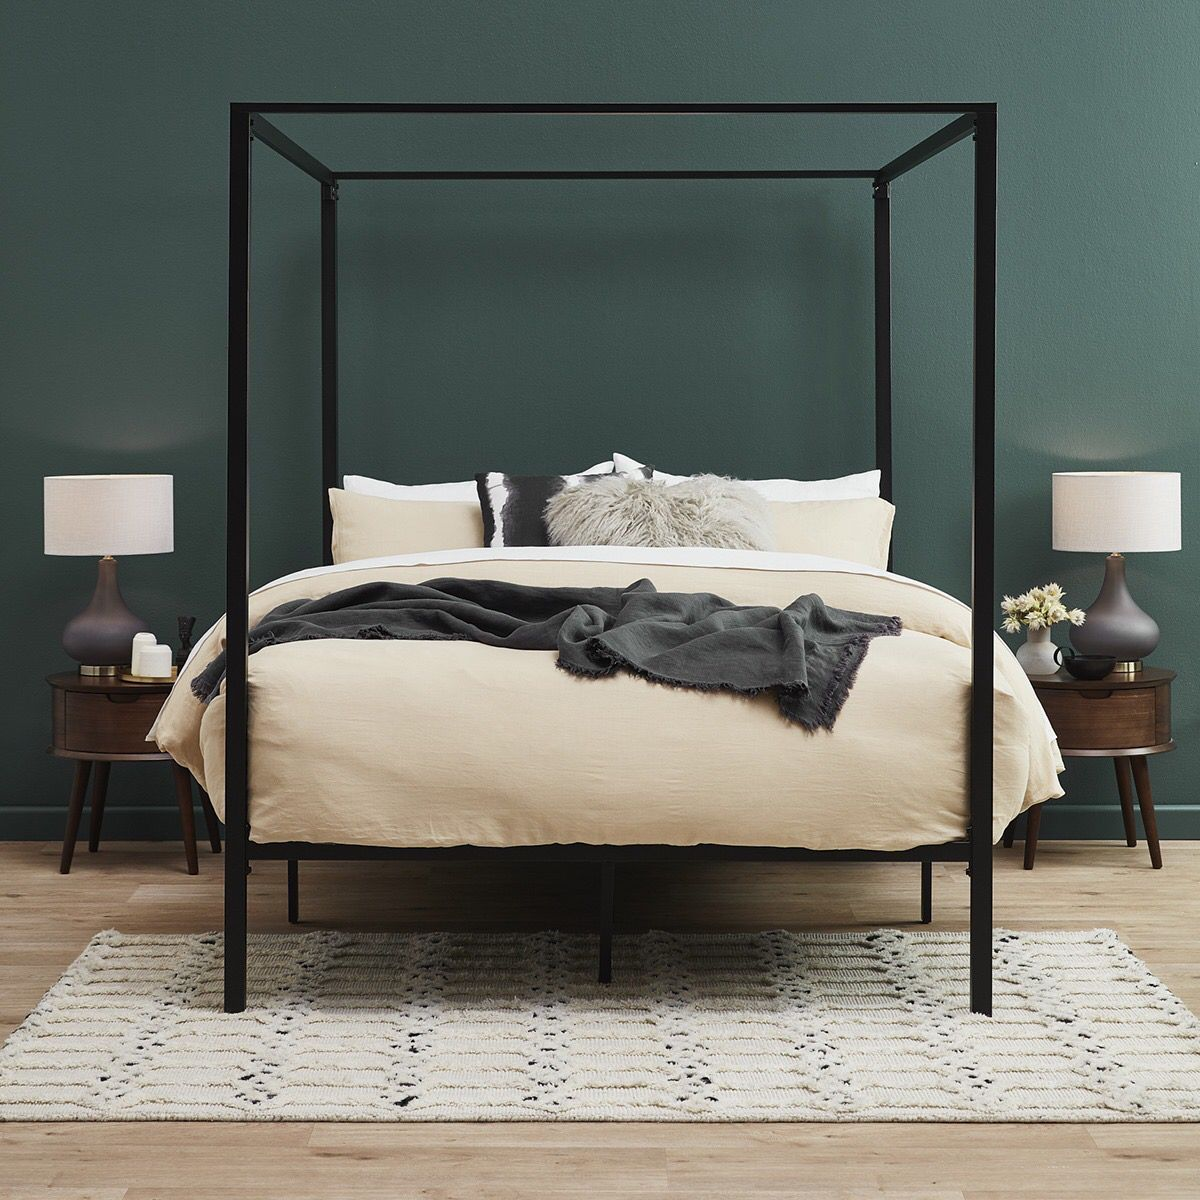 Pin by Astari Yasmin on interior in 2020 Canopy bed